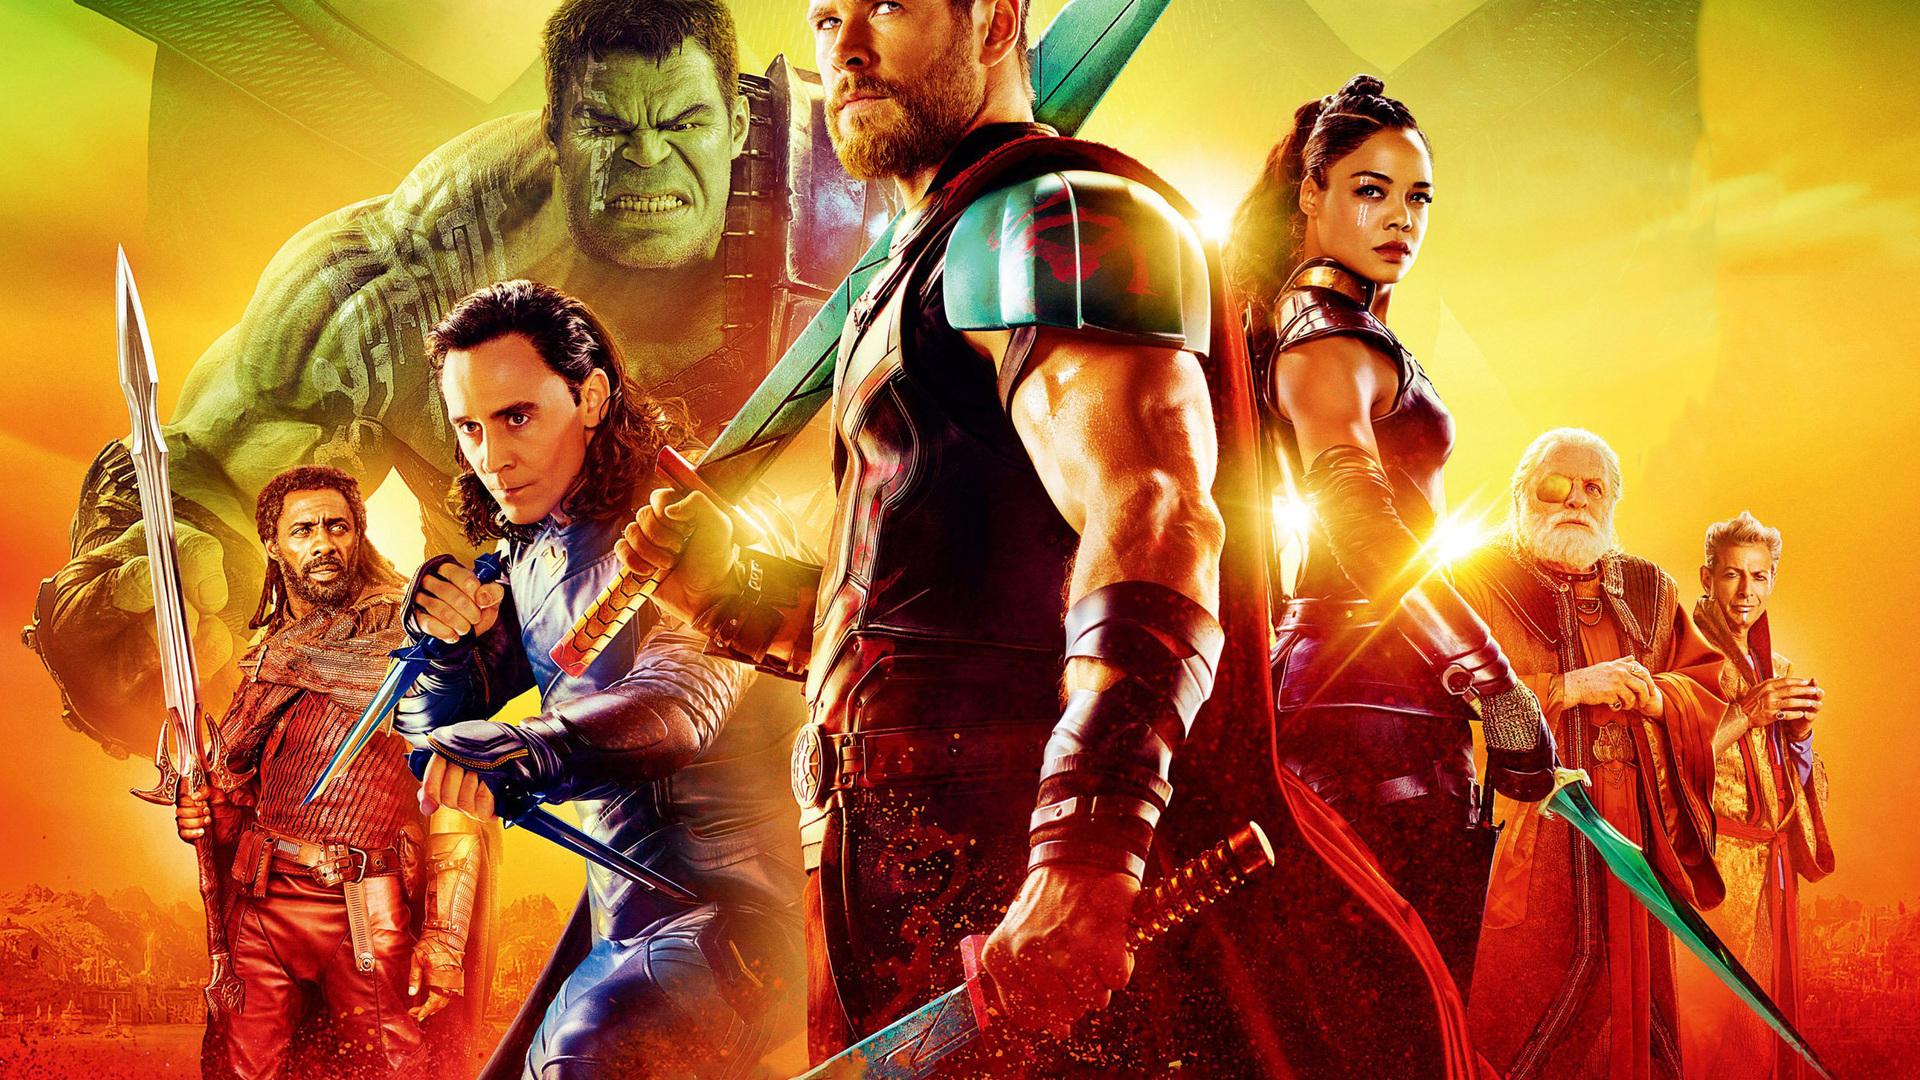 1920x1080 Thor Ragnarok 2017 Movie Laptop Full HD 1080P HD ...